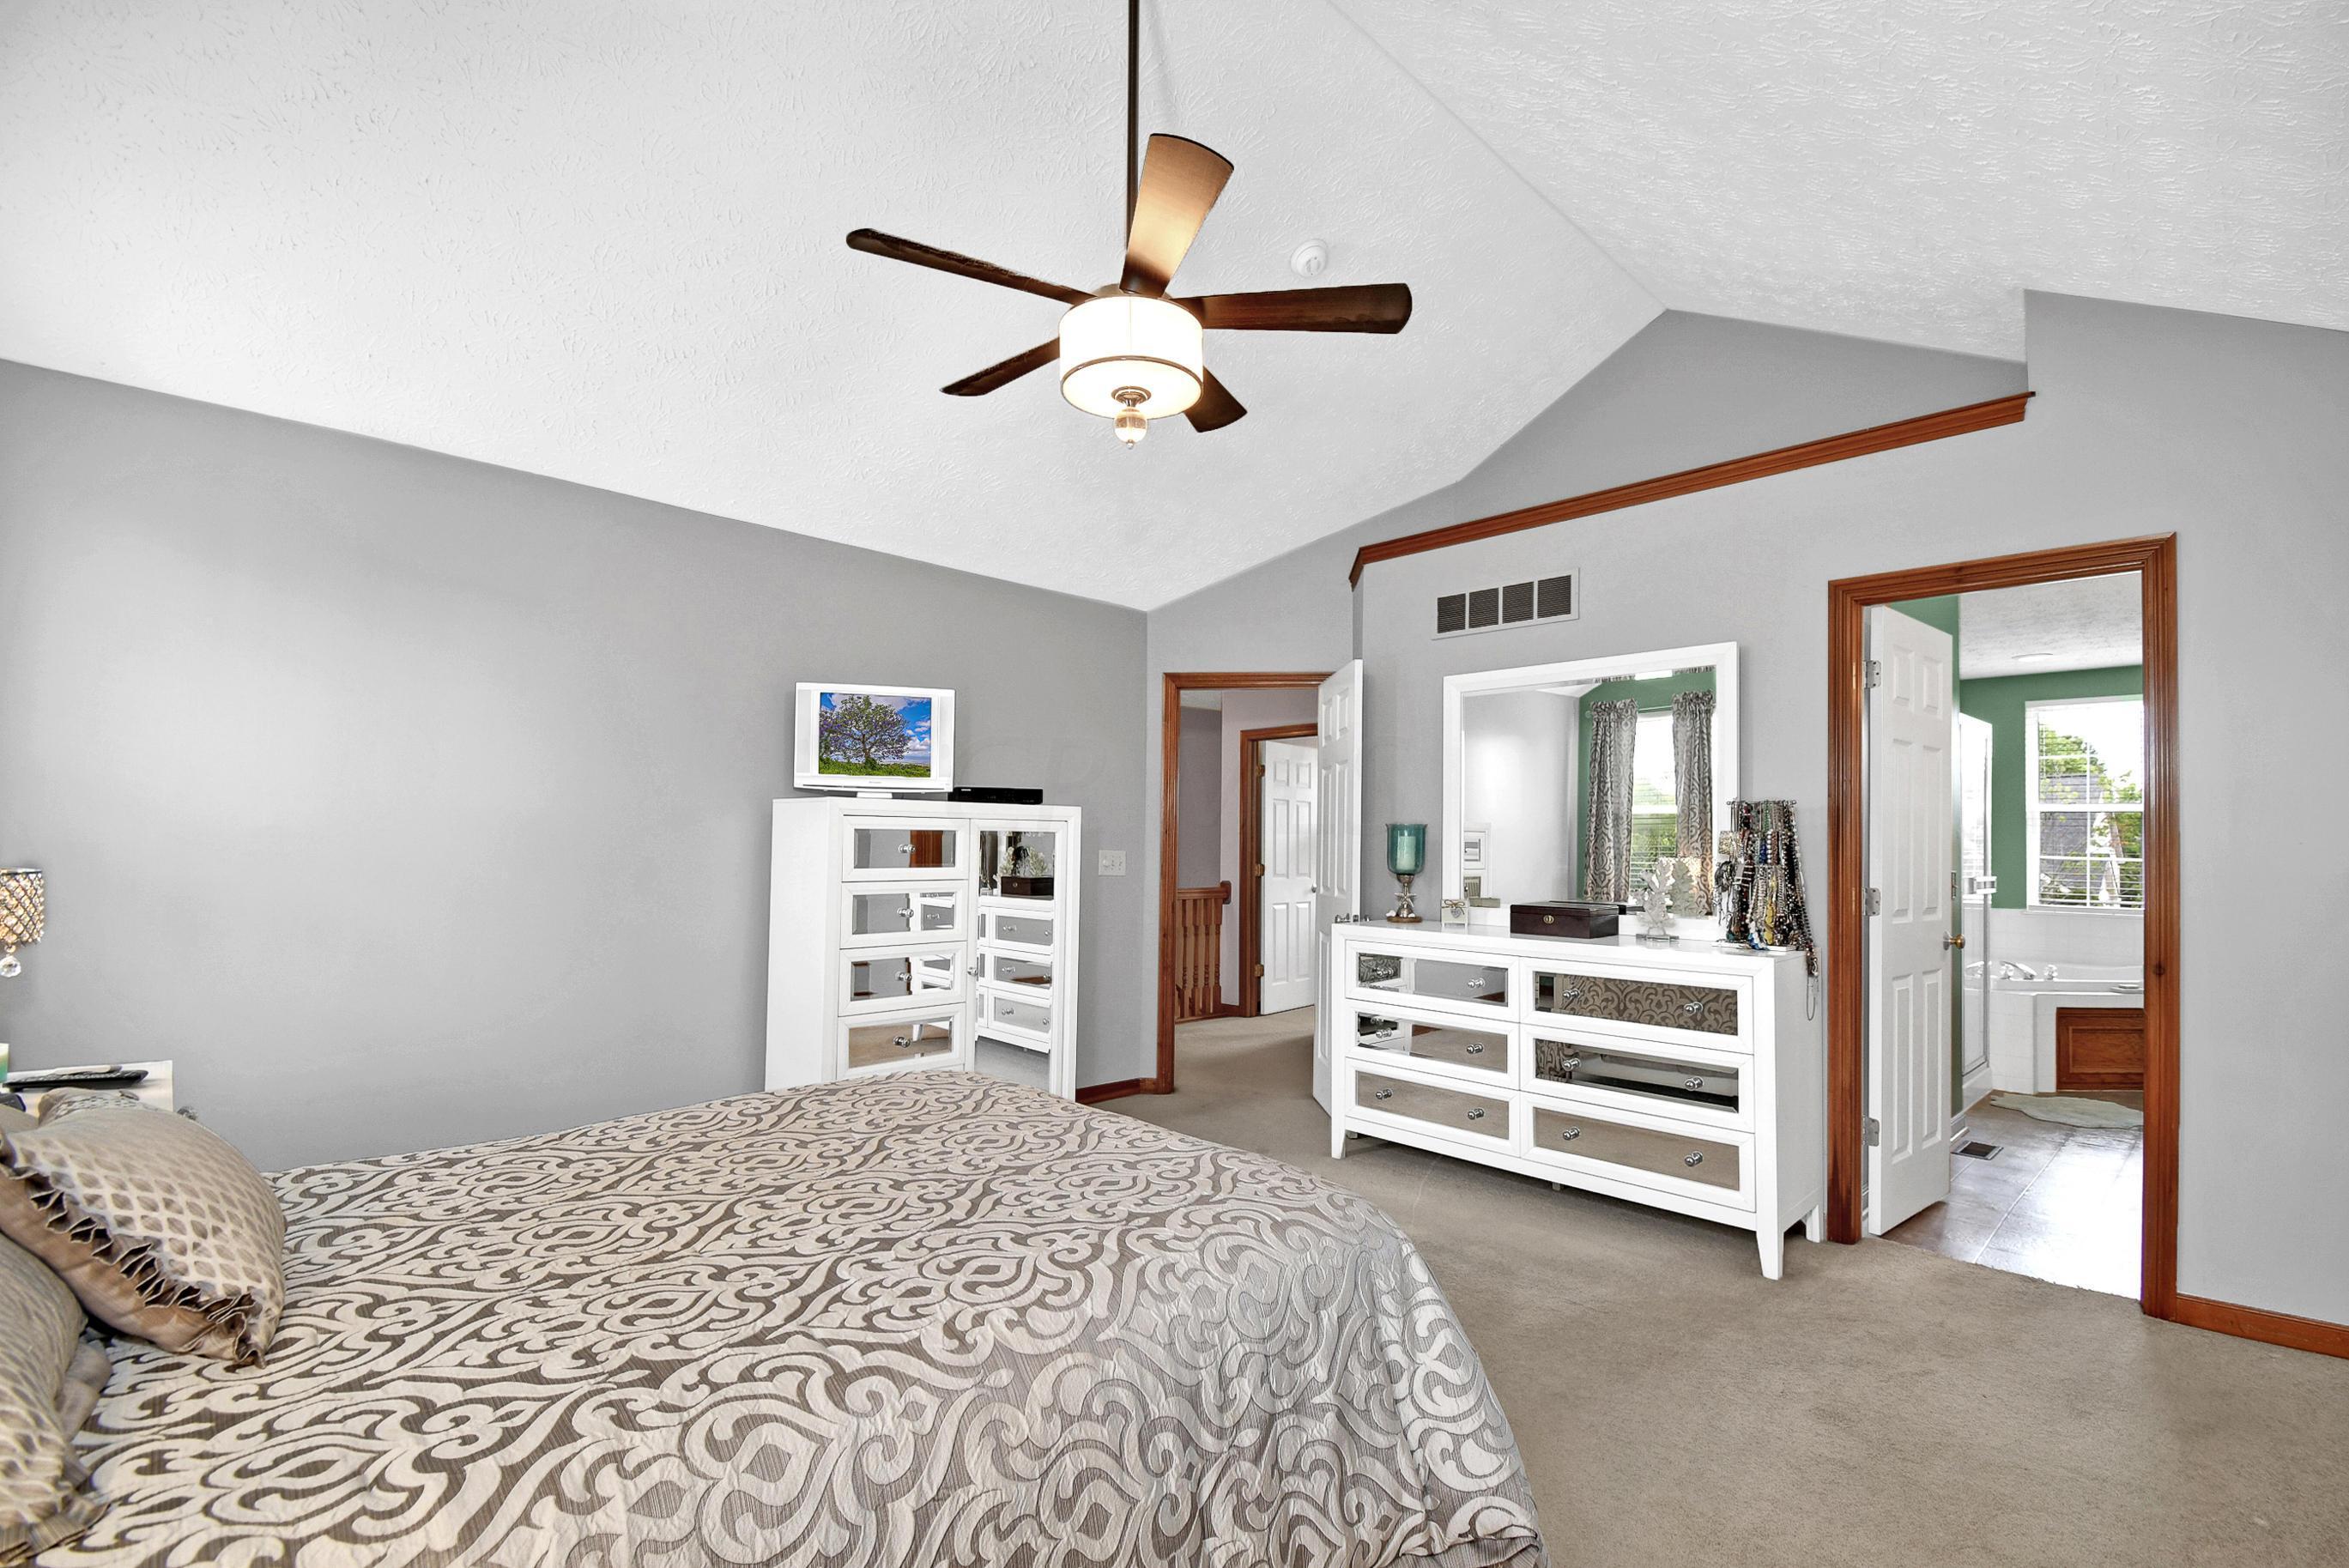 7647 Windsor Drive, Dublin, Ohio 43016, 4 Bedrooms Bedrooms, ,3 BathroomsBathrooms,Residential,For Sale,Windsor,220020363